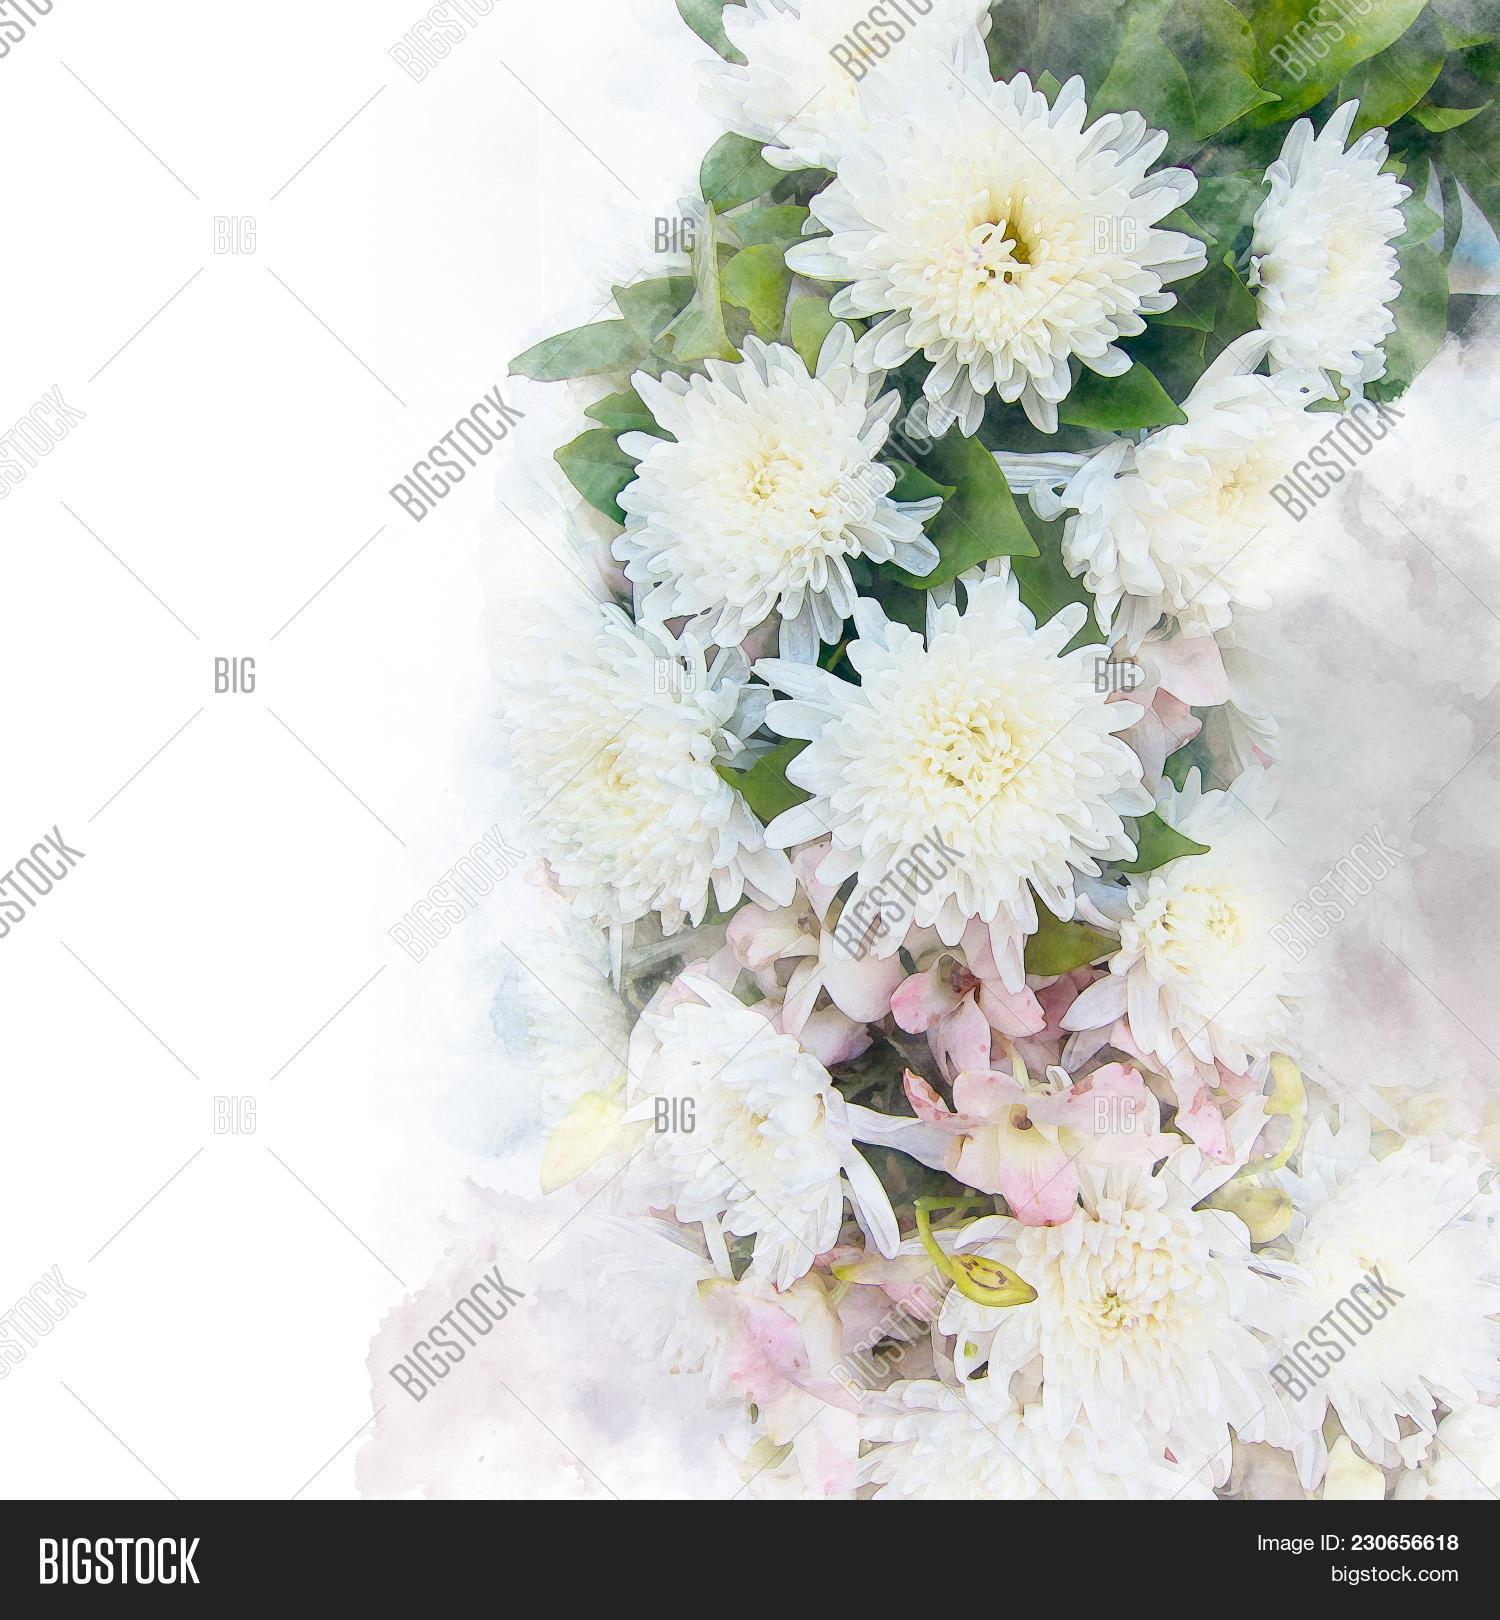 Illustration Blossom Image Photo Free Trial Bigstock